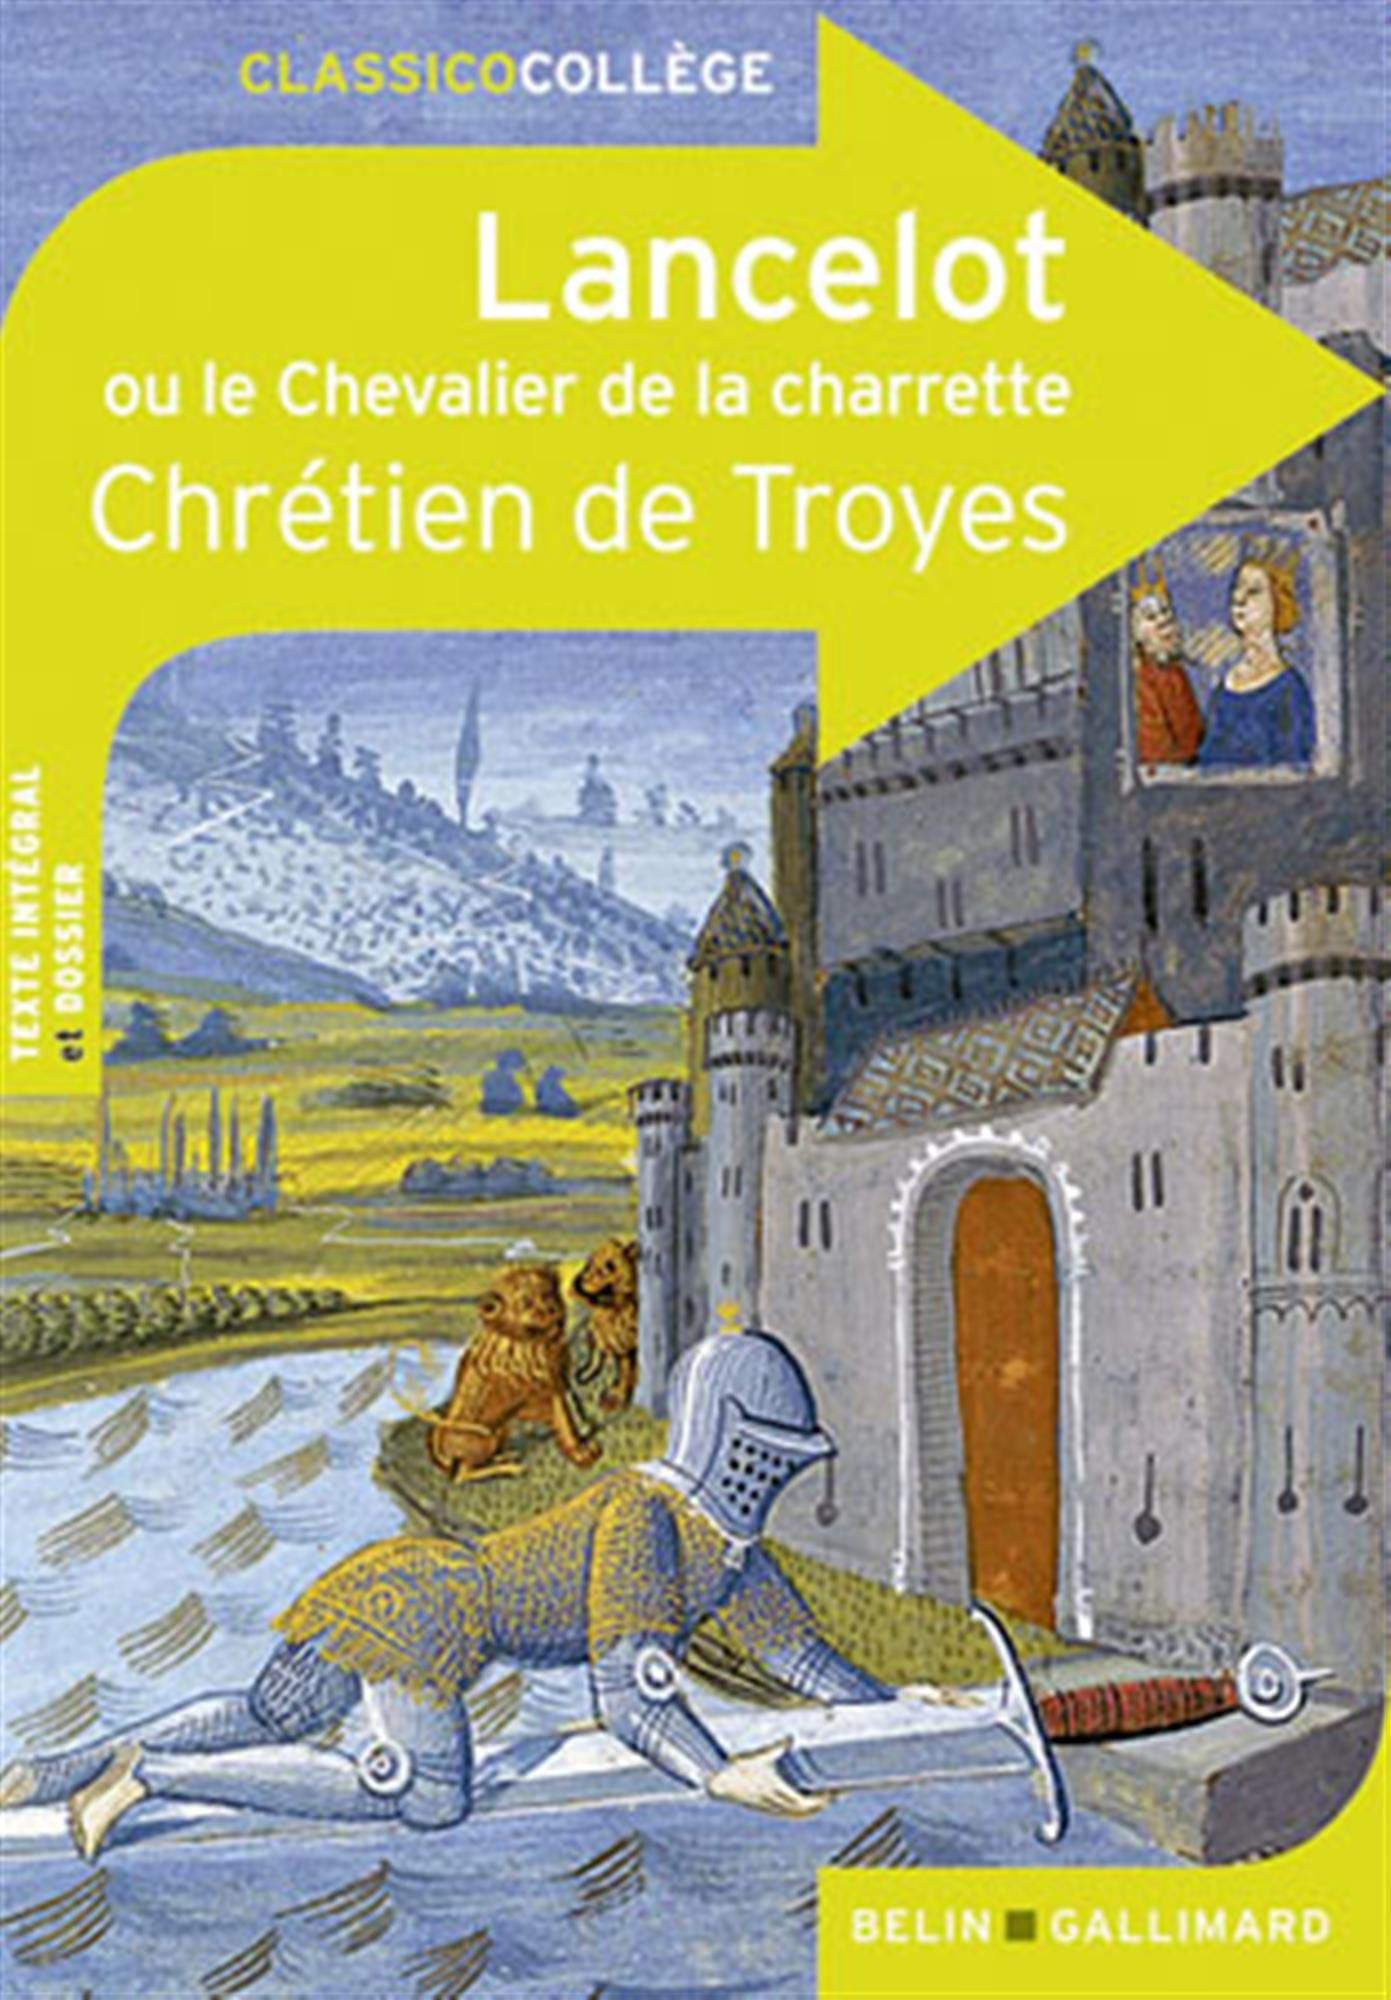 Ado Troyes Dating Site caut o doamna singura in bač femei vaduve care cauta barbati in cugir